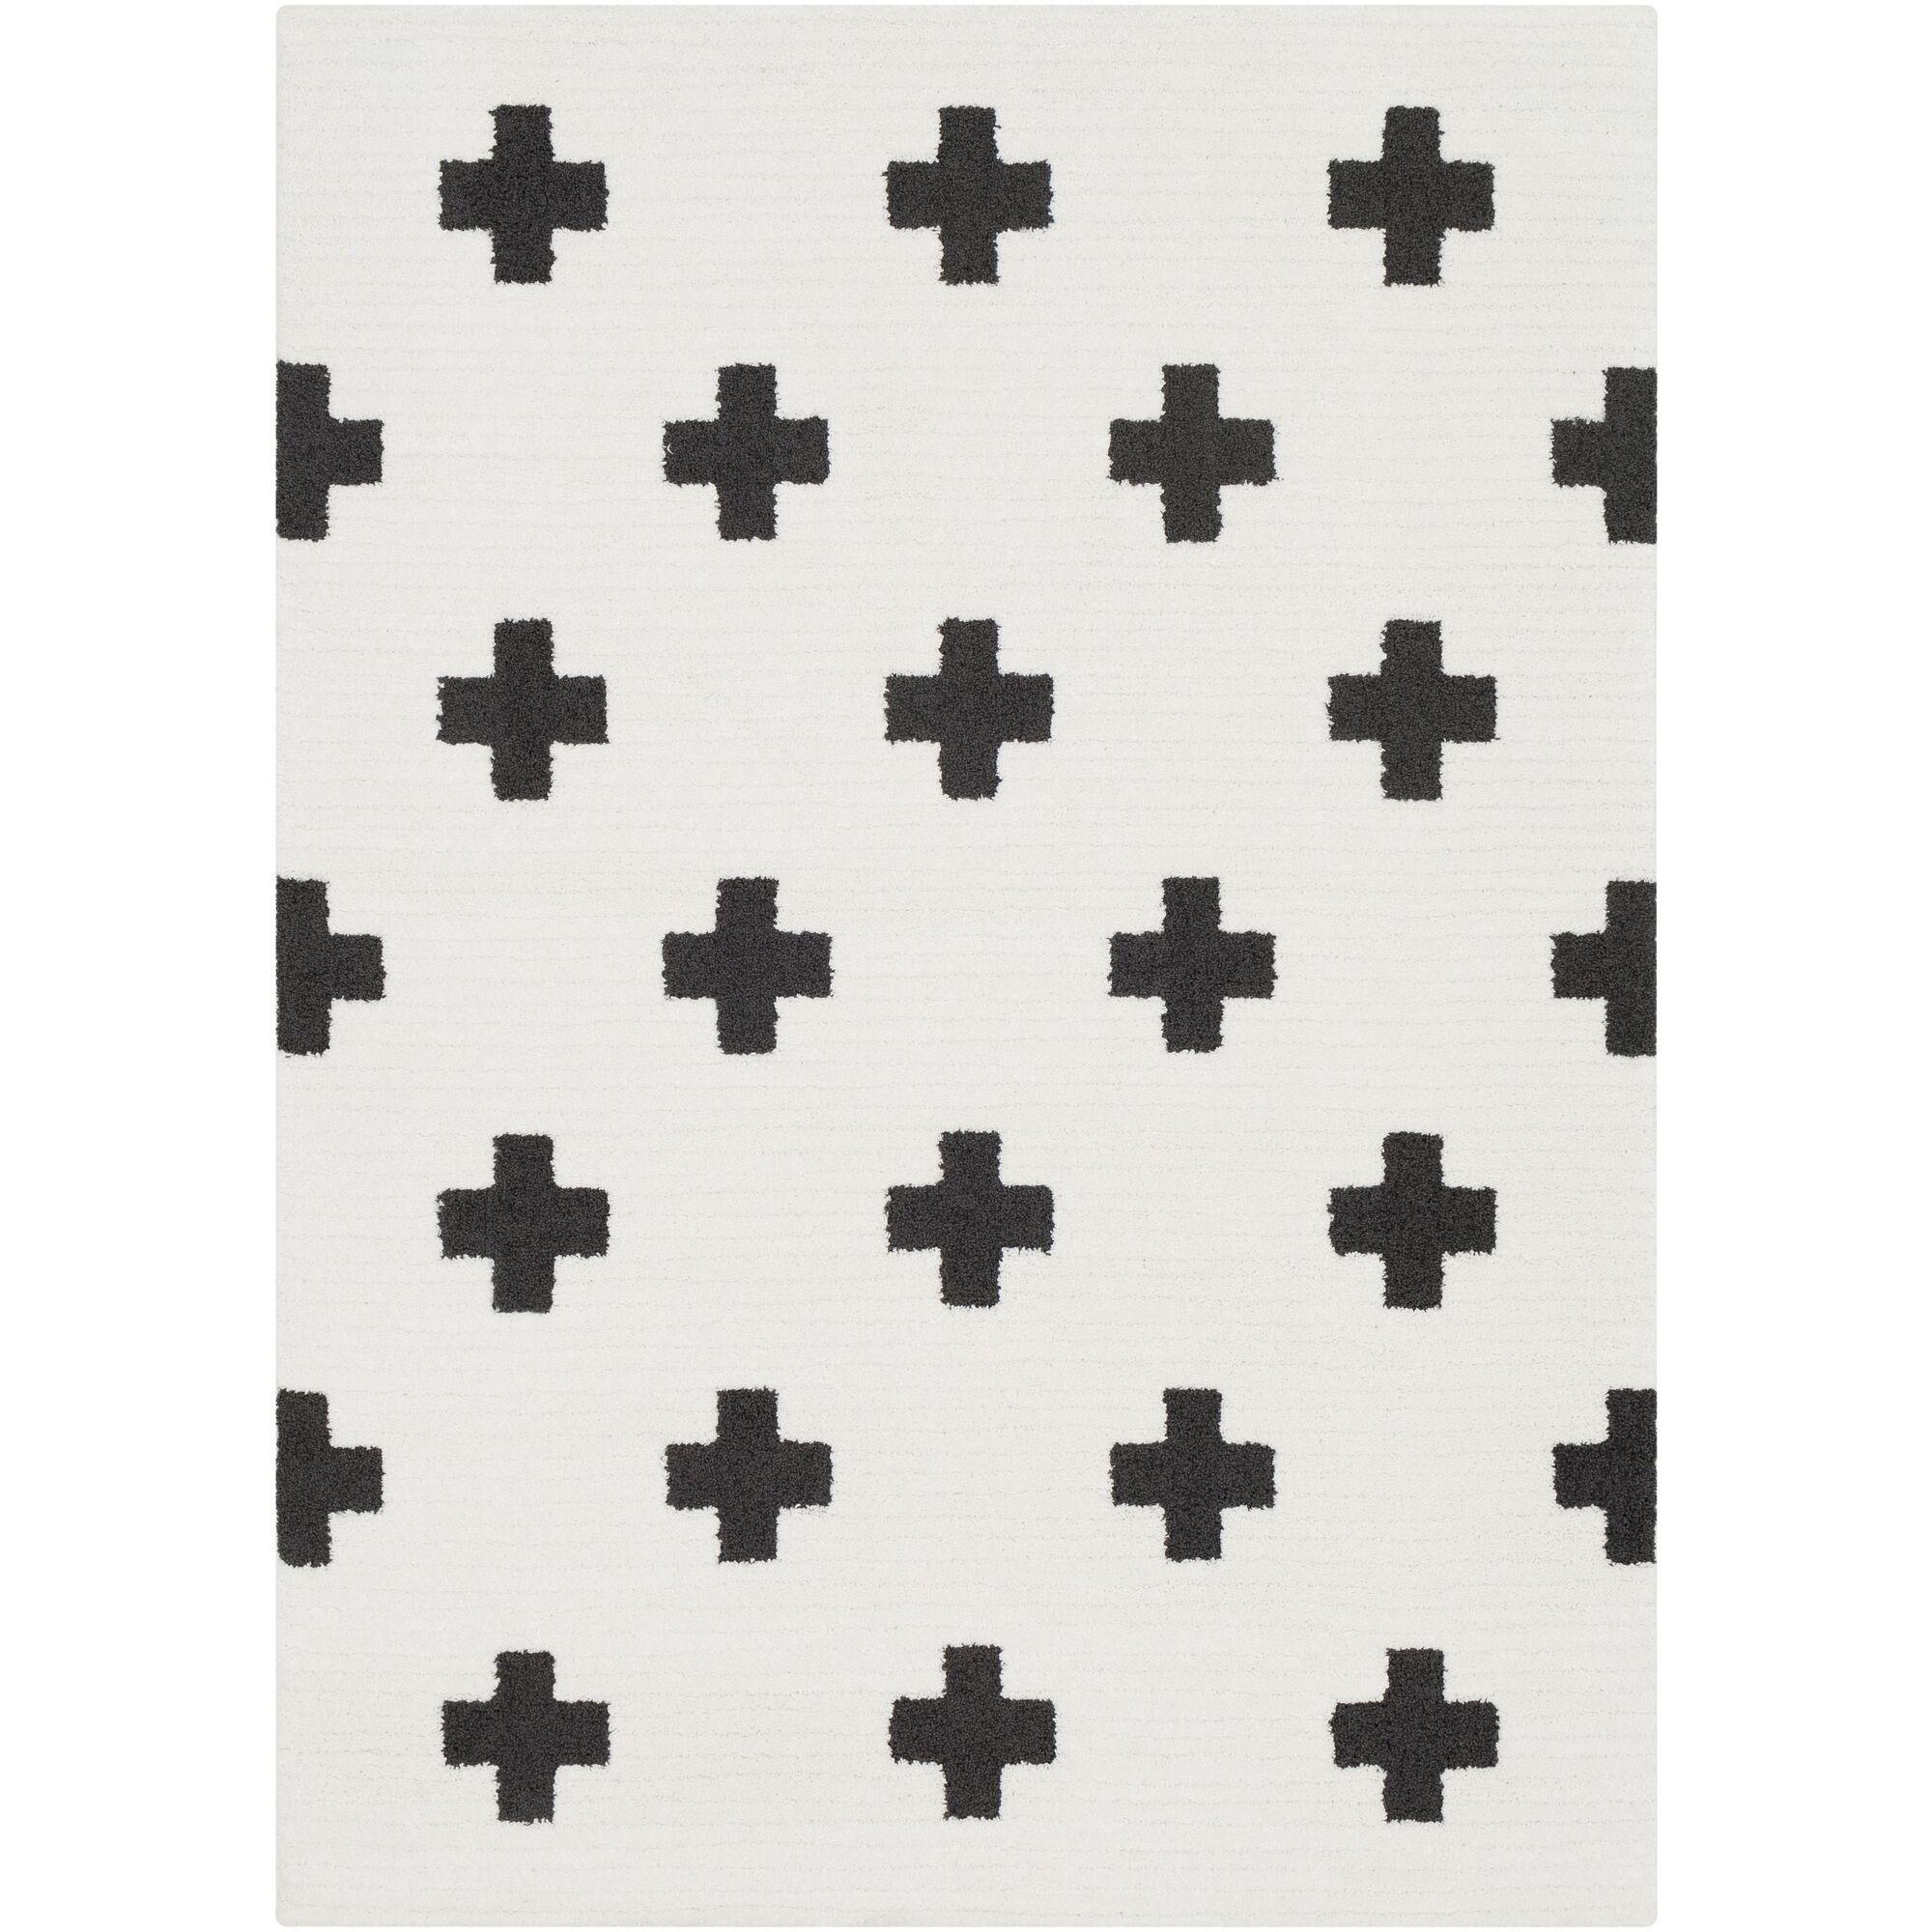 Elissa Boho Crafted Charcoal/White Area Rug Rug Size: Rectangle 6'7